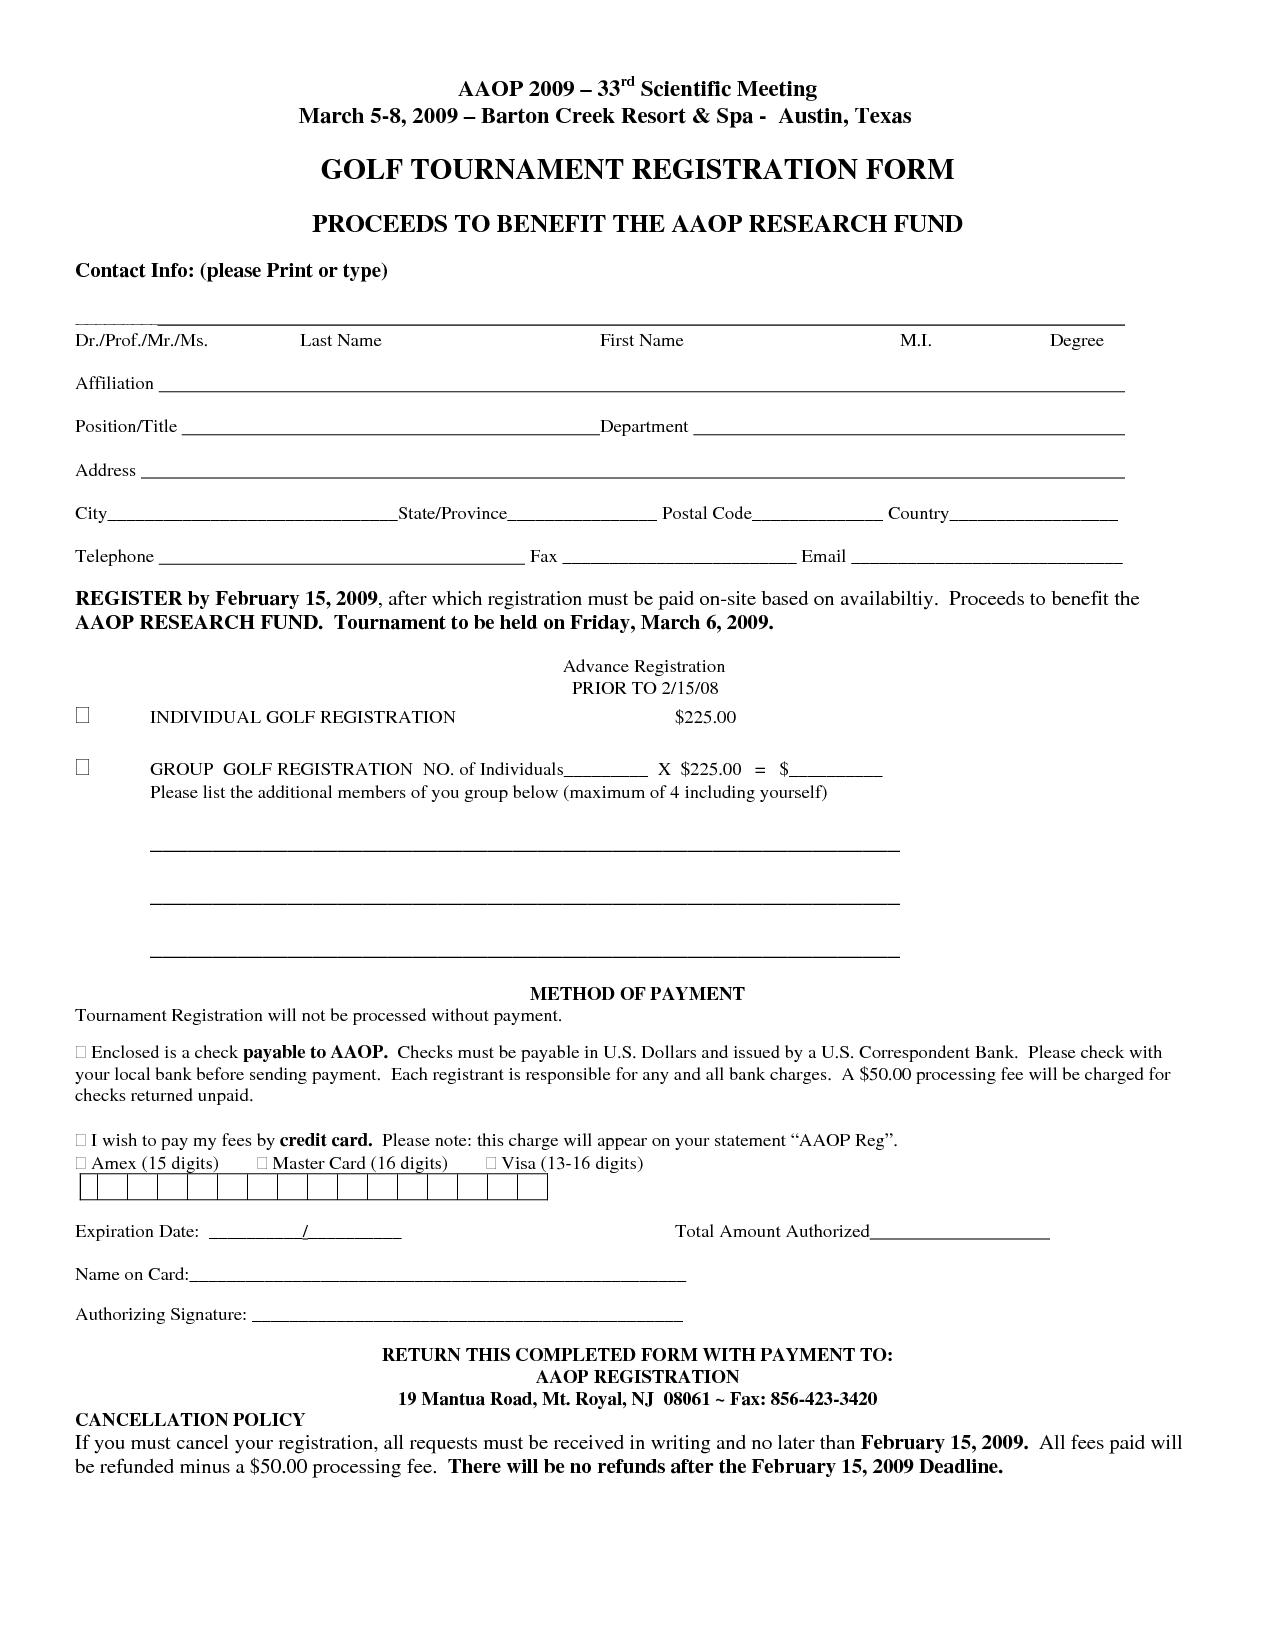 Golf Event Registration Form Template